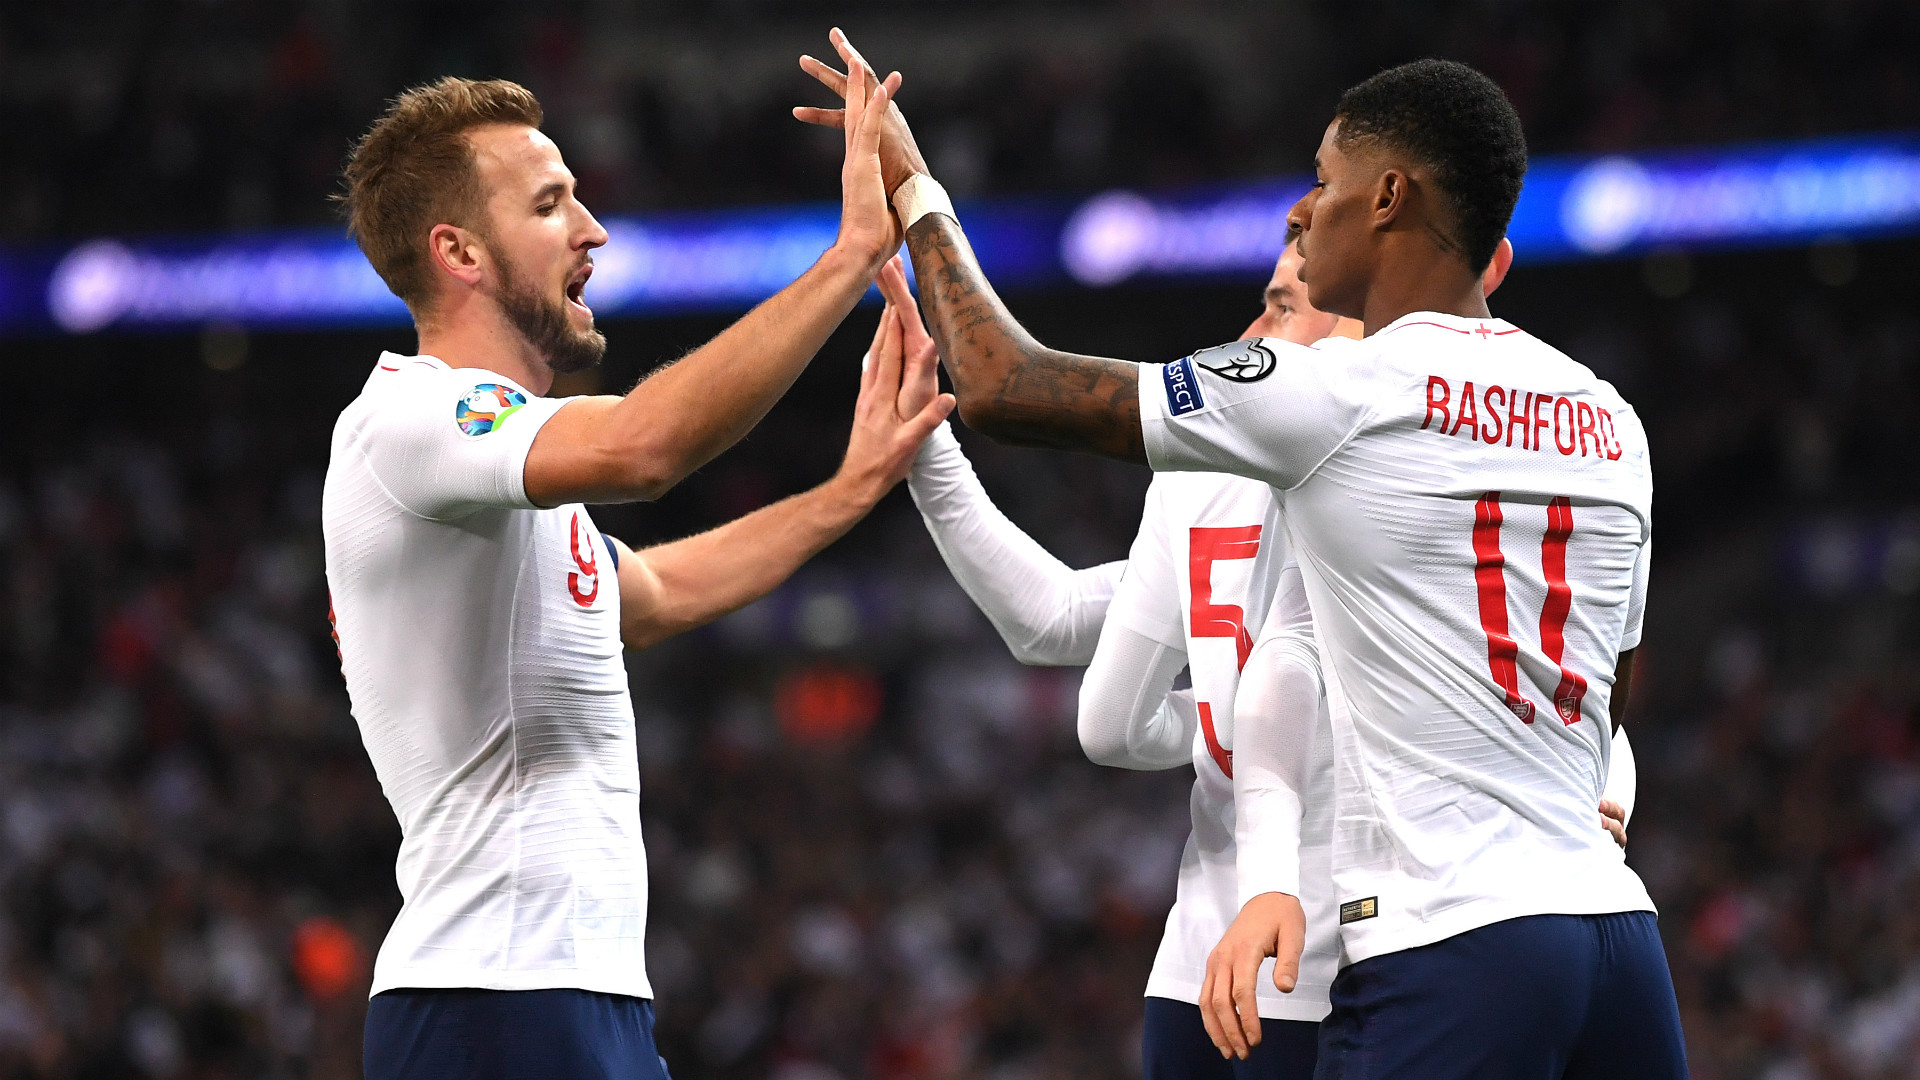 England need Kane & Rashford to be fit' - Shearer sees injured stars as  crucial to Euro 2020 bid | Goal.com